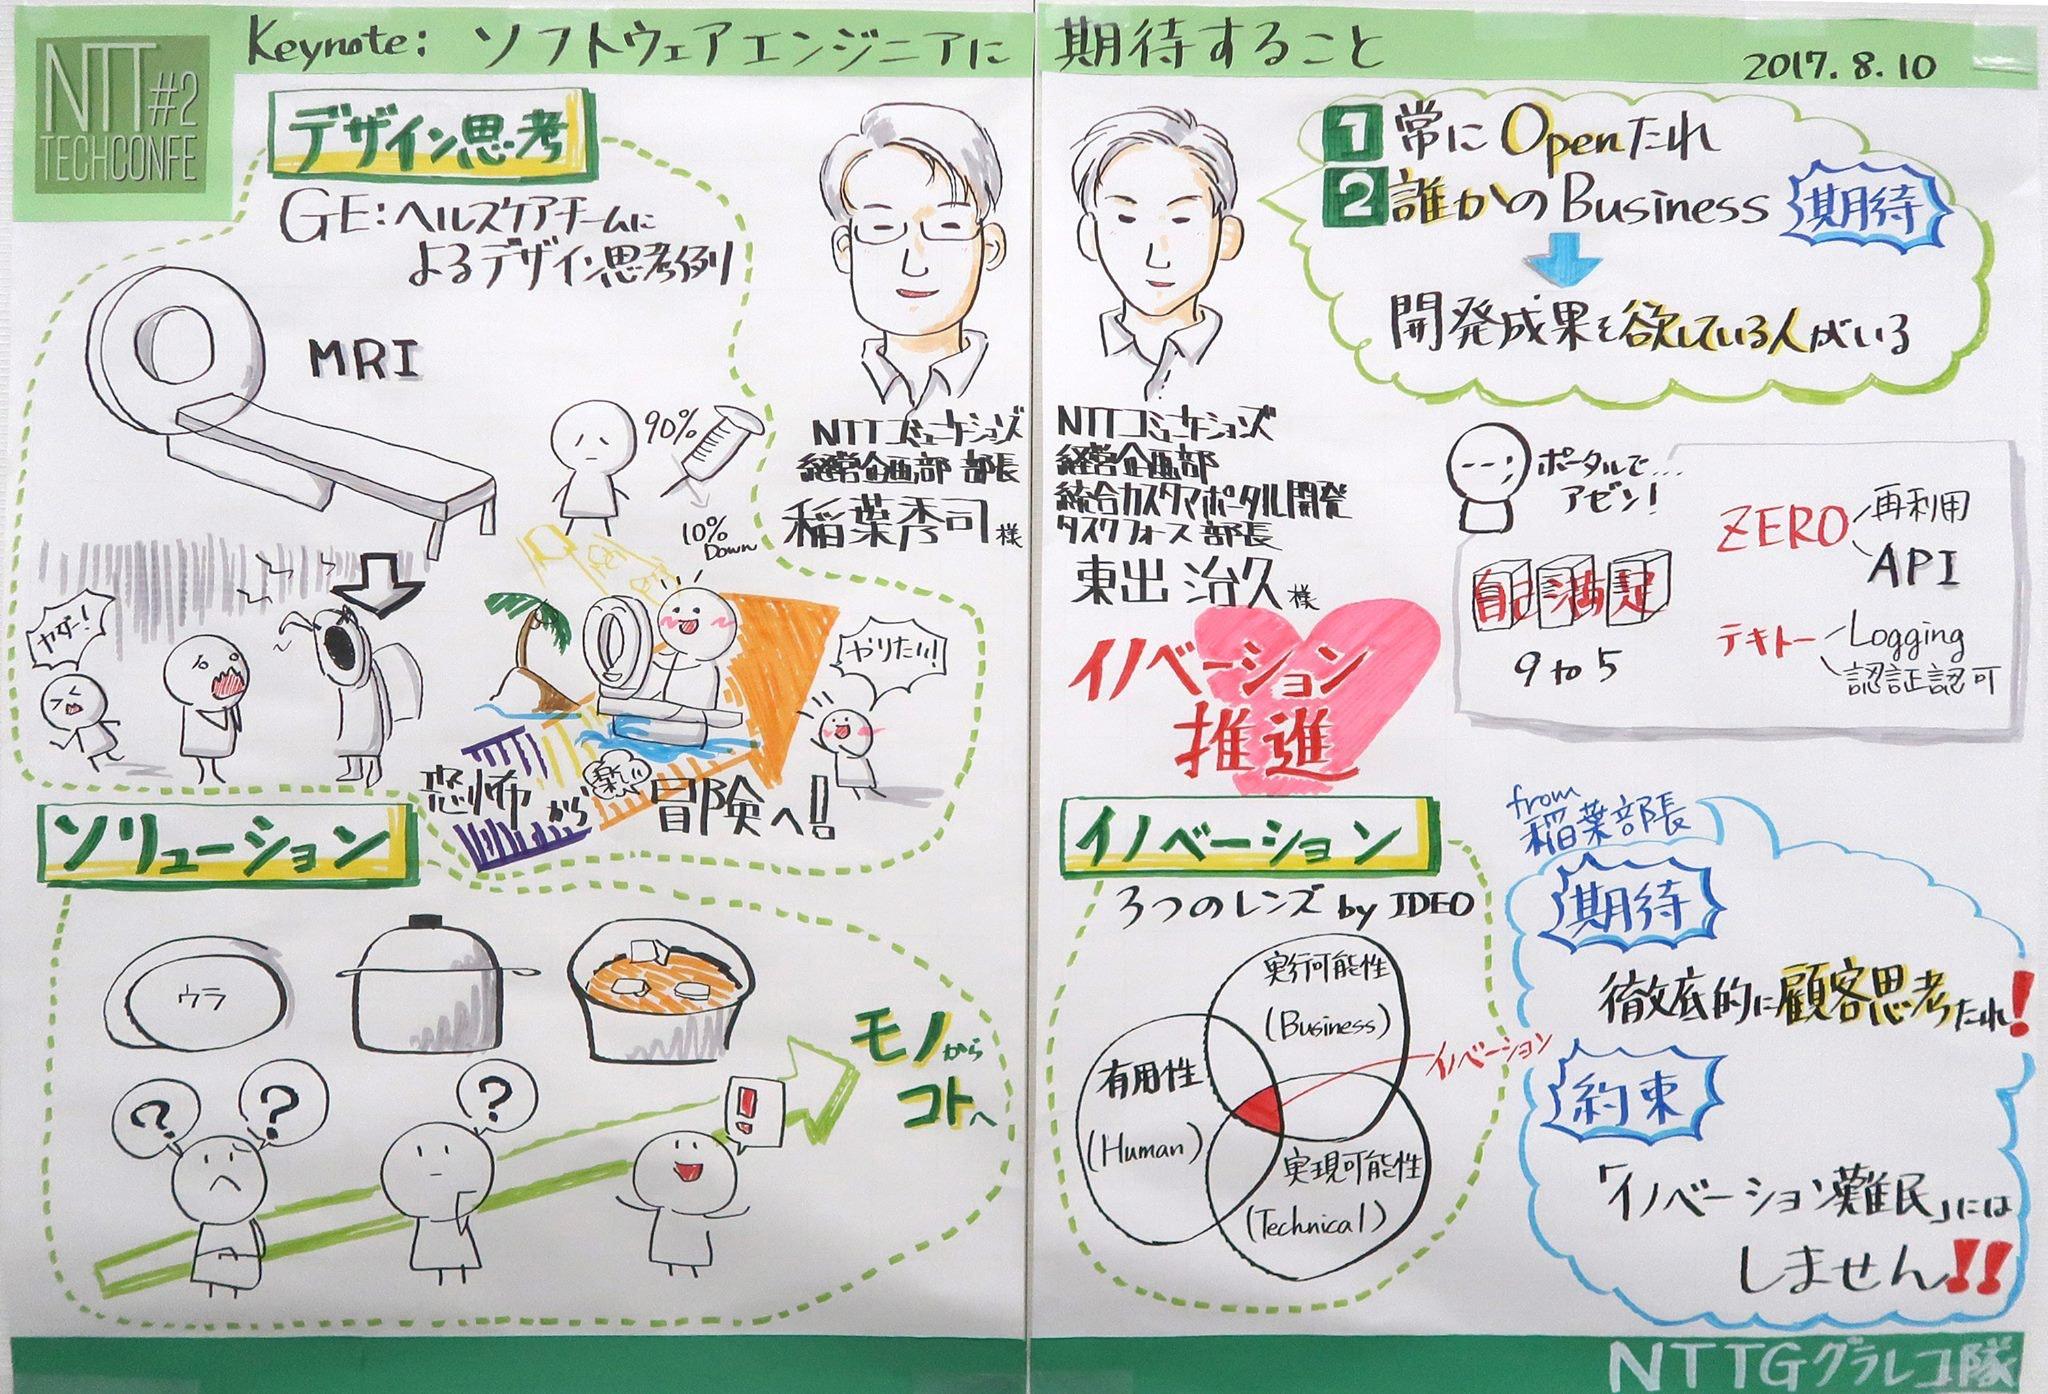 NTT Tech Conference #2の基調講演のグラレコ